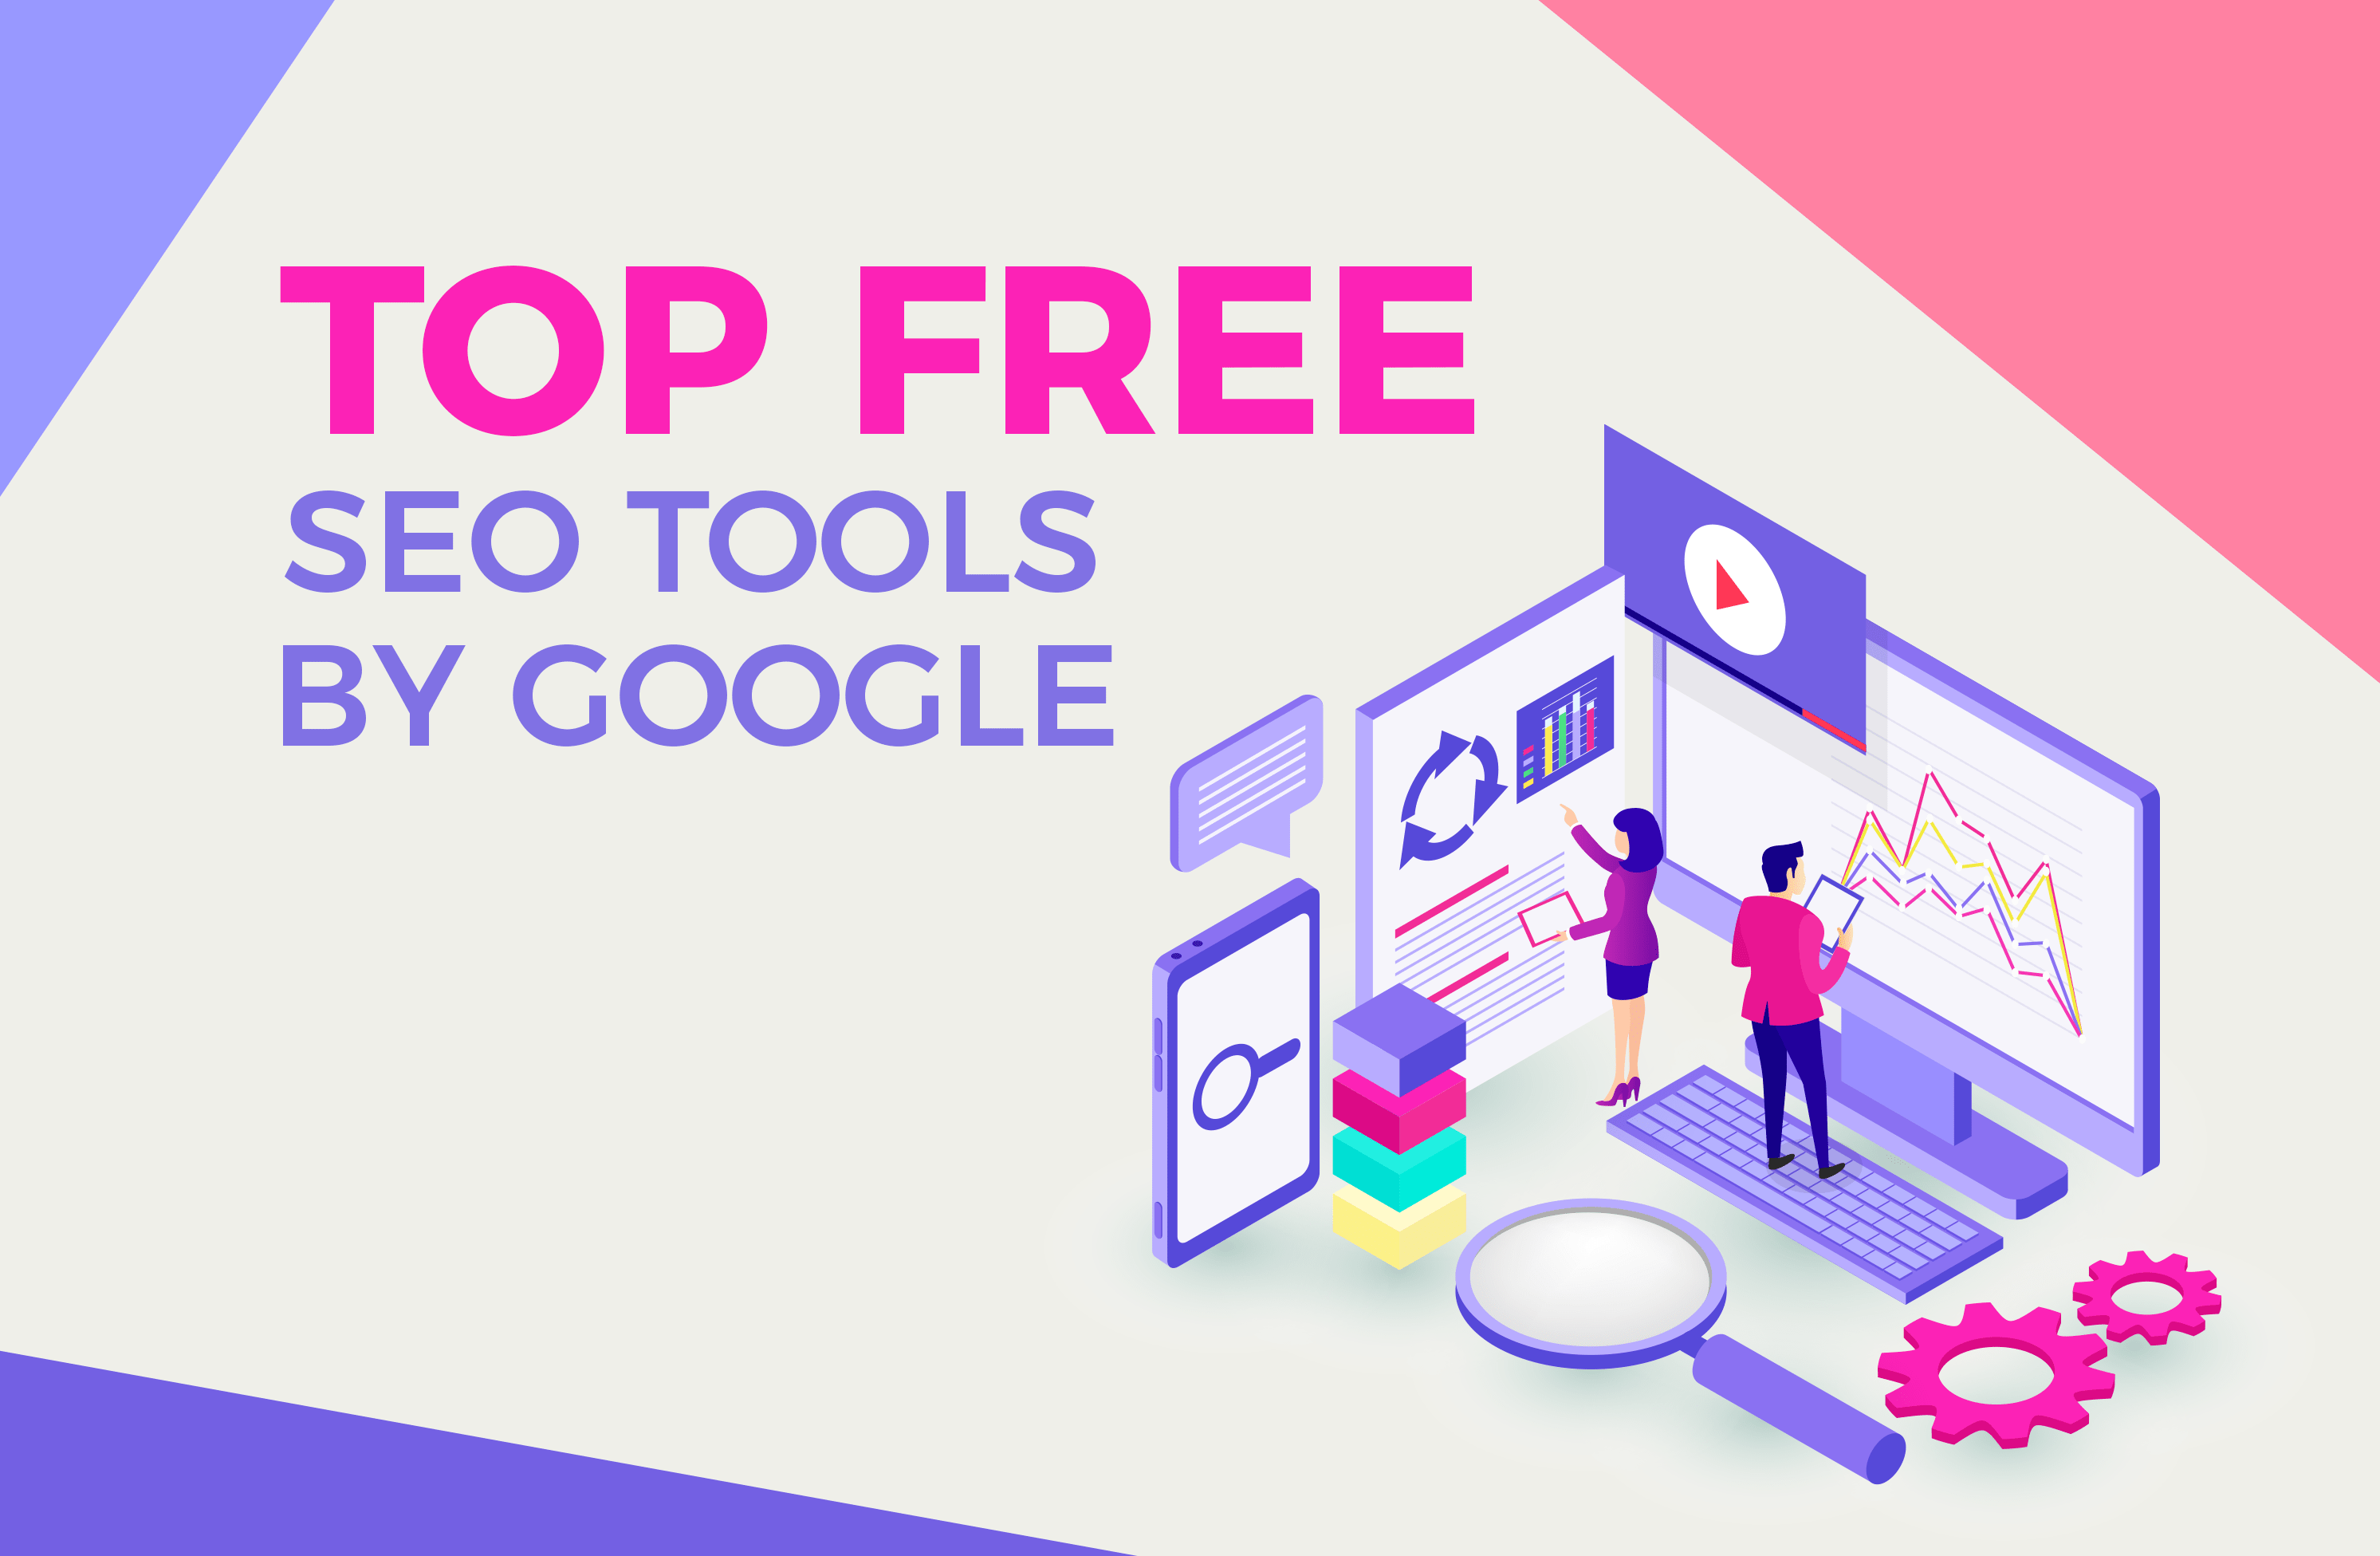 Blog- Top 5 Free SEO Tools By Google